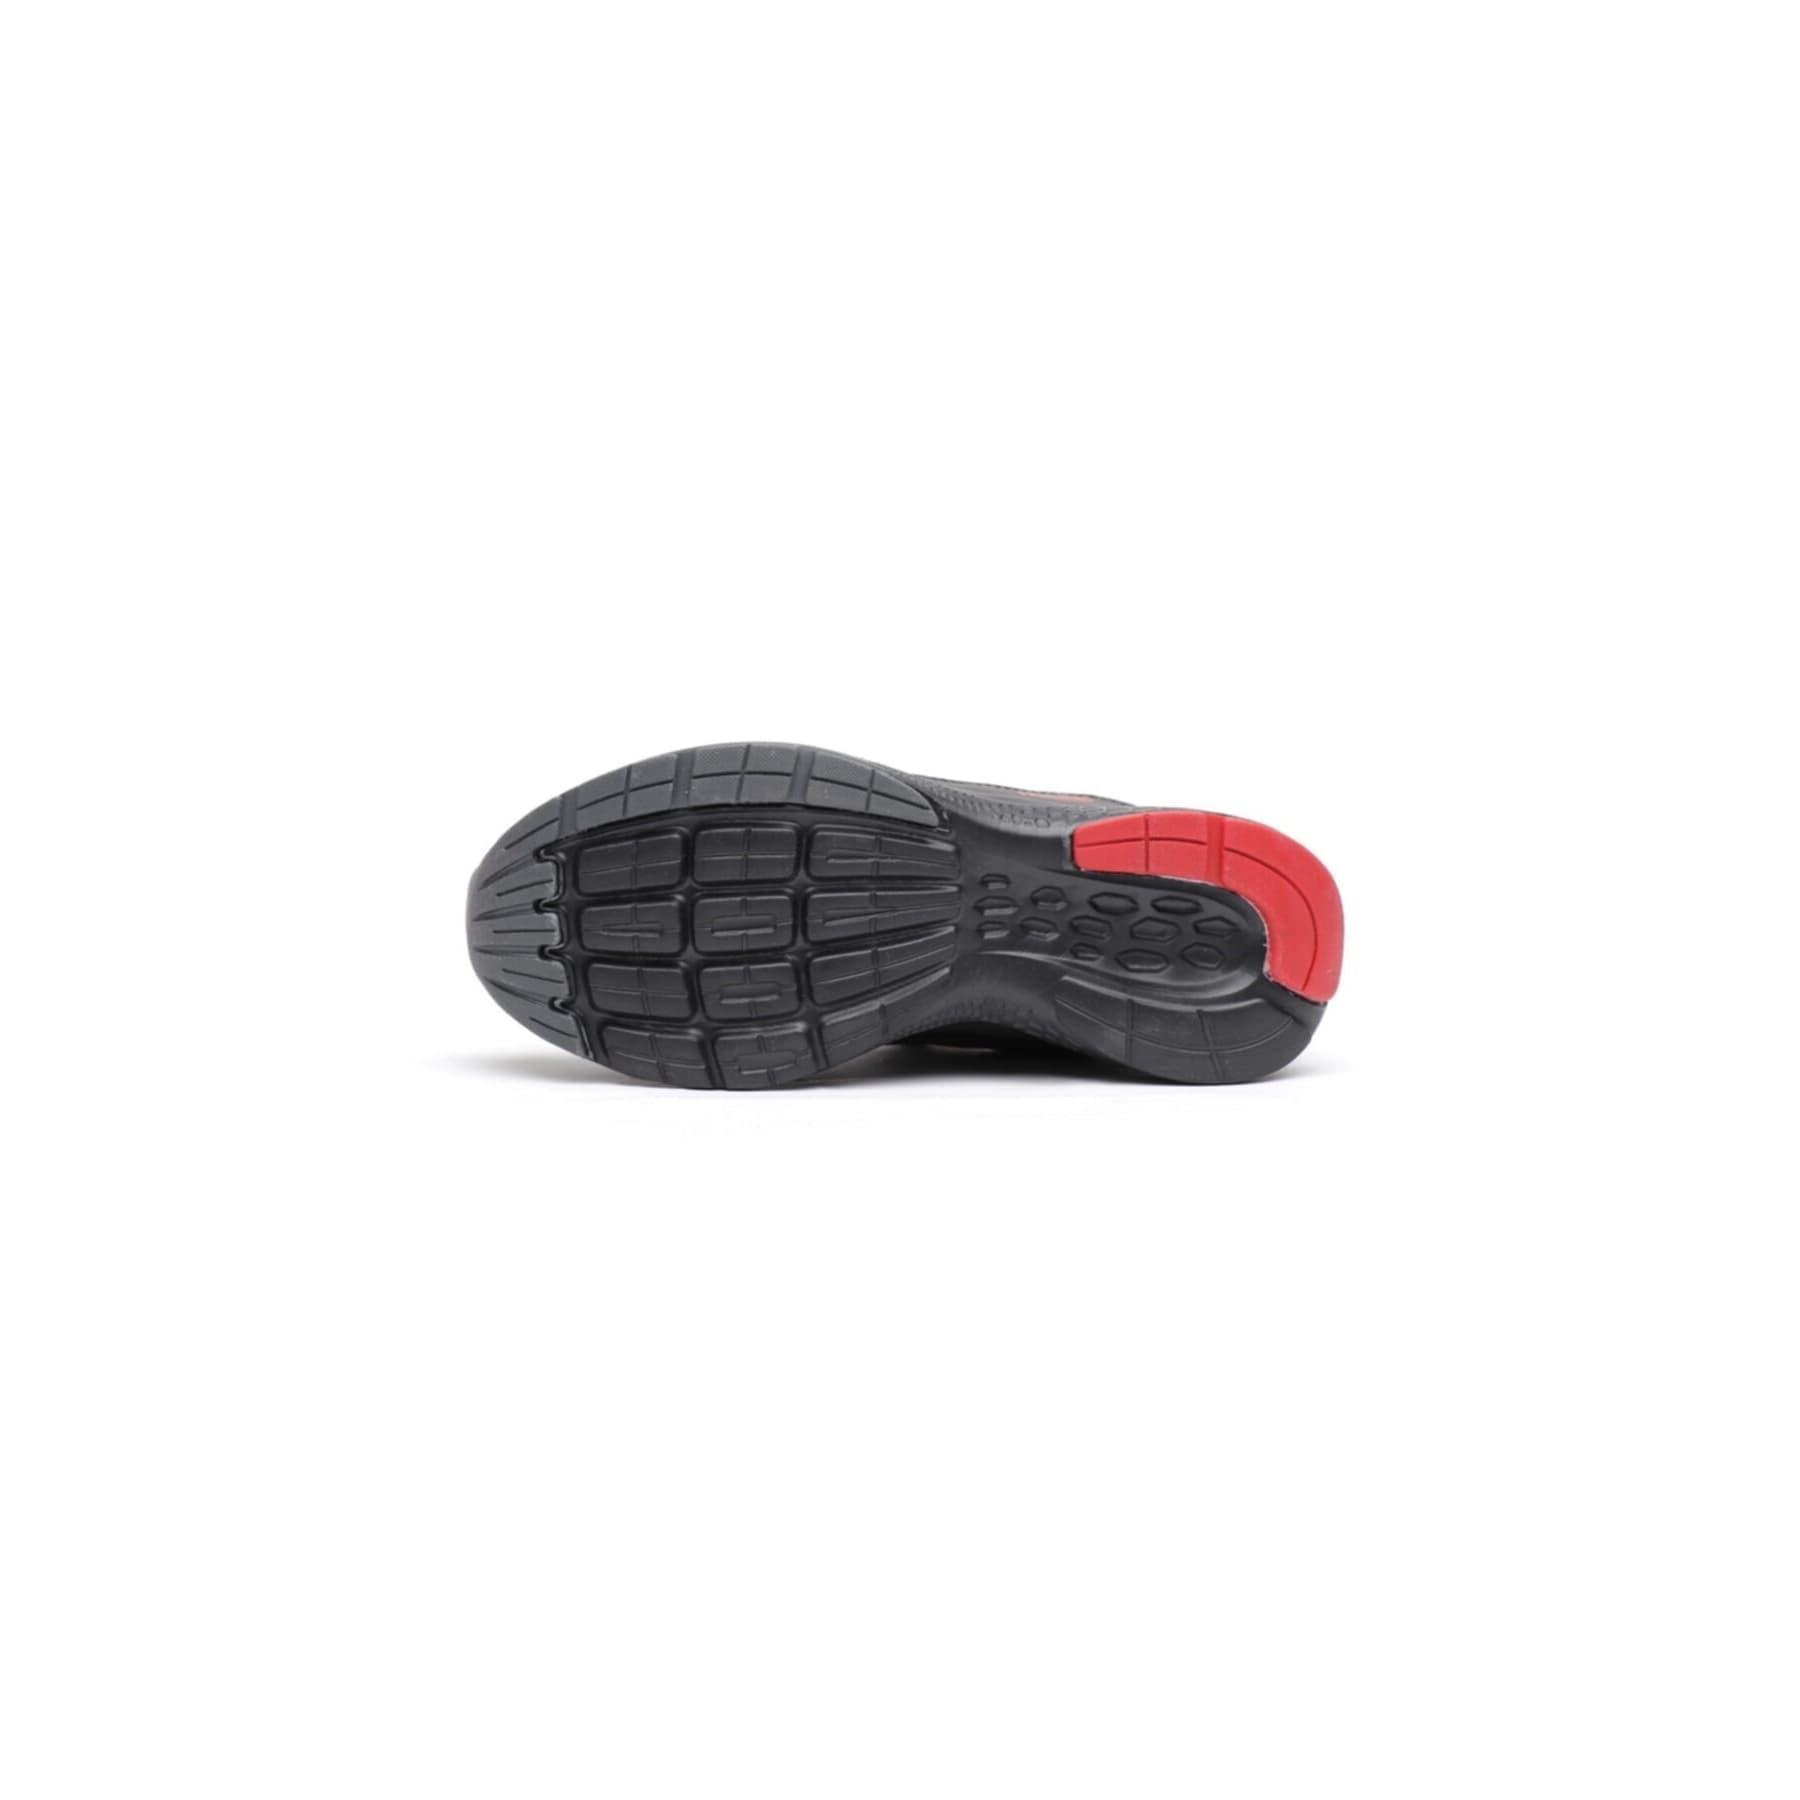 Hummel Alp Erkek Siyah Outdoor Ayakkabı (900020-1034)